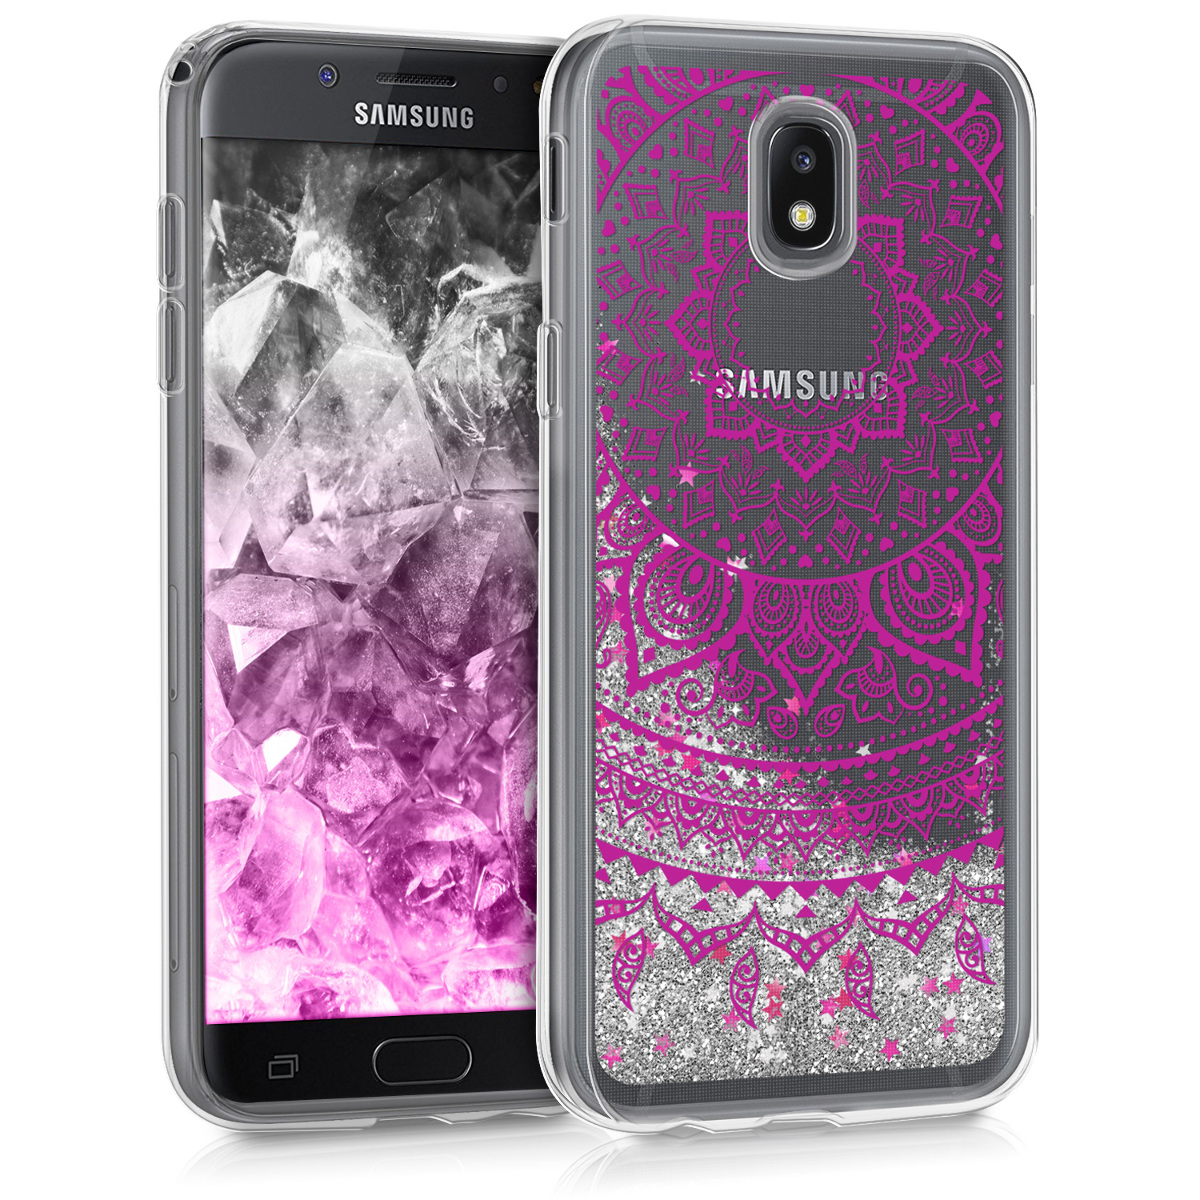 KW Θήκη Σιλικόνης Samsung Galaxy J5 2017 - Dark Pink / Silver / Transparent (42857.01)